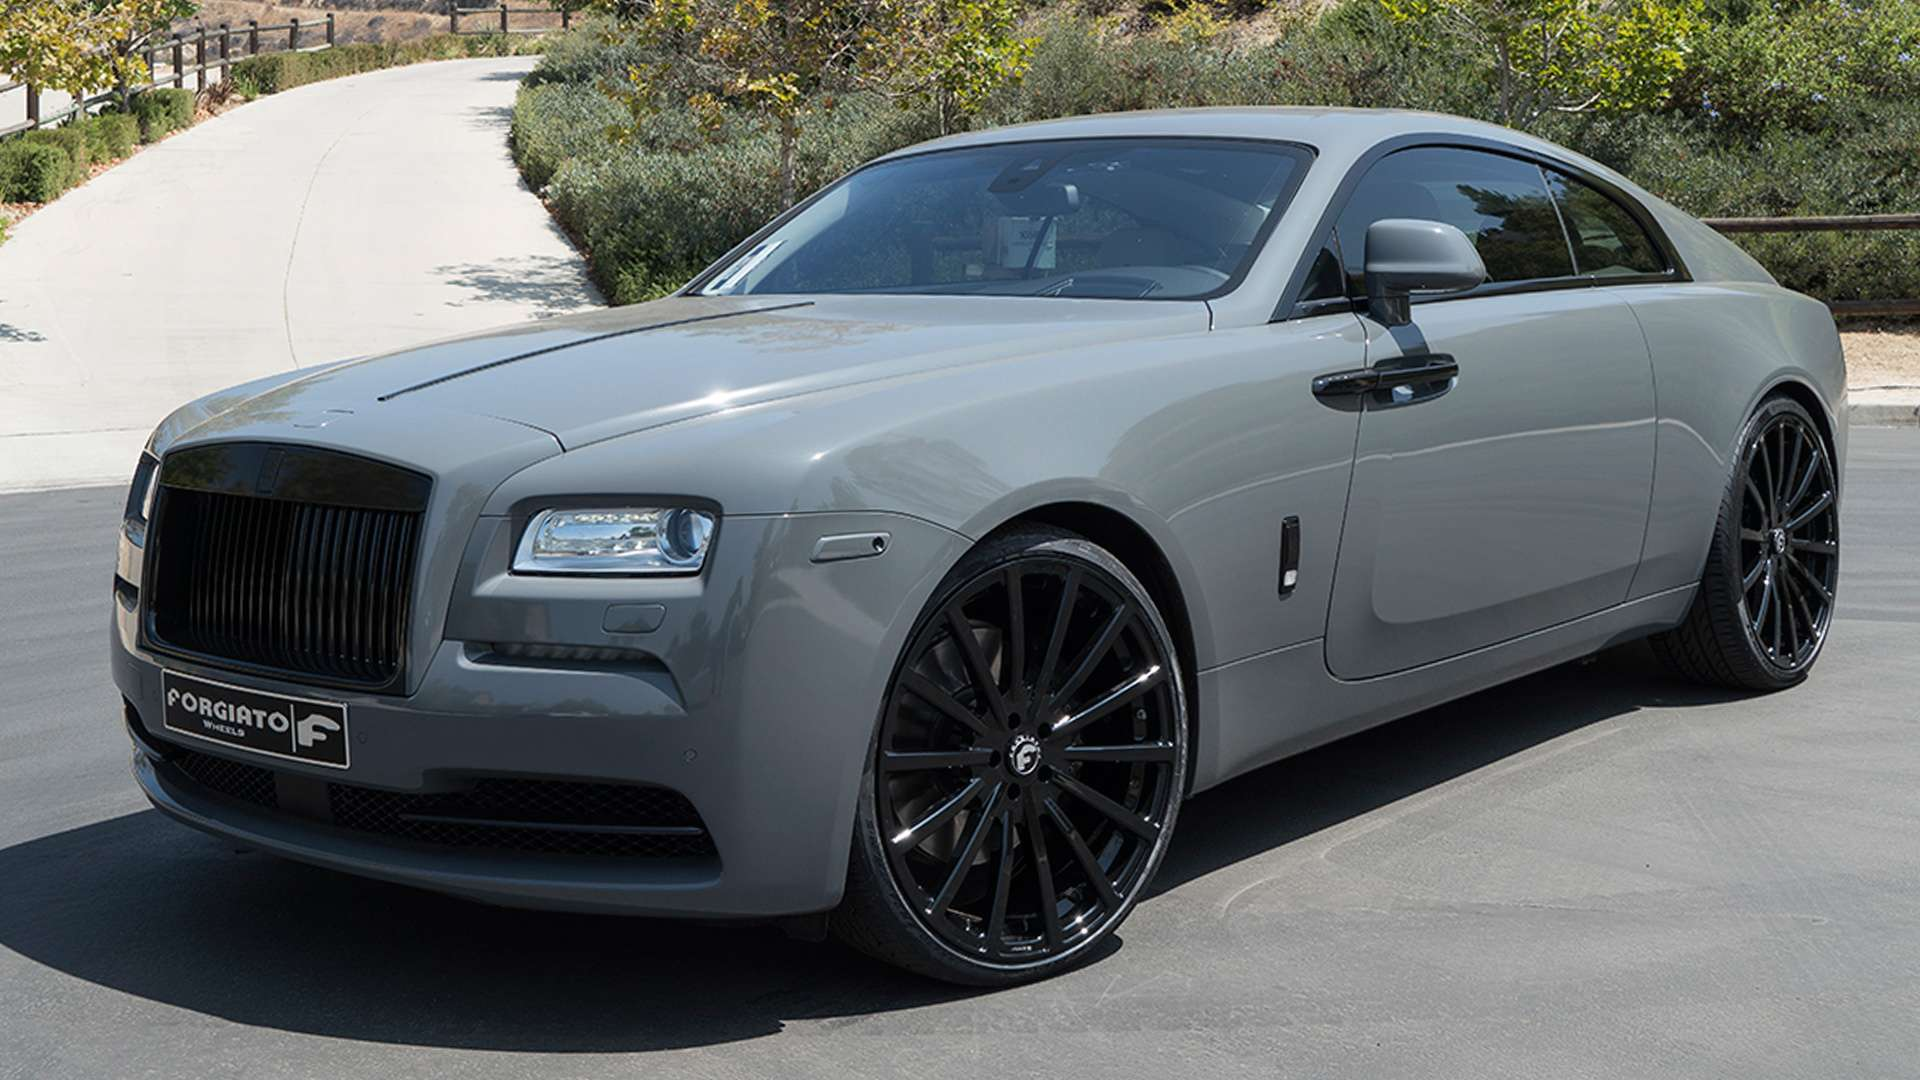 Rolls Royce Wraith Rdb On Forgiato Wheels Photos